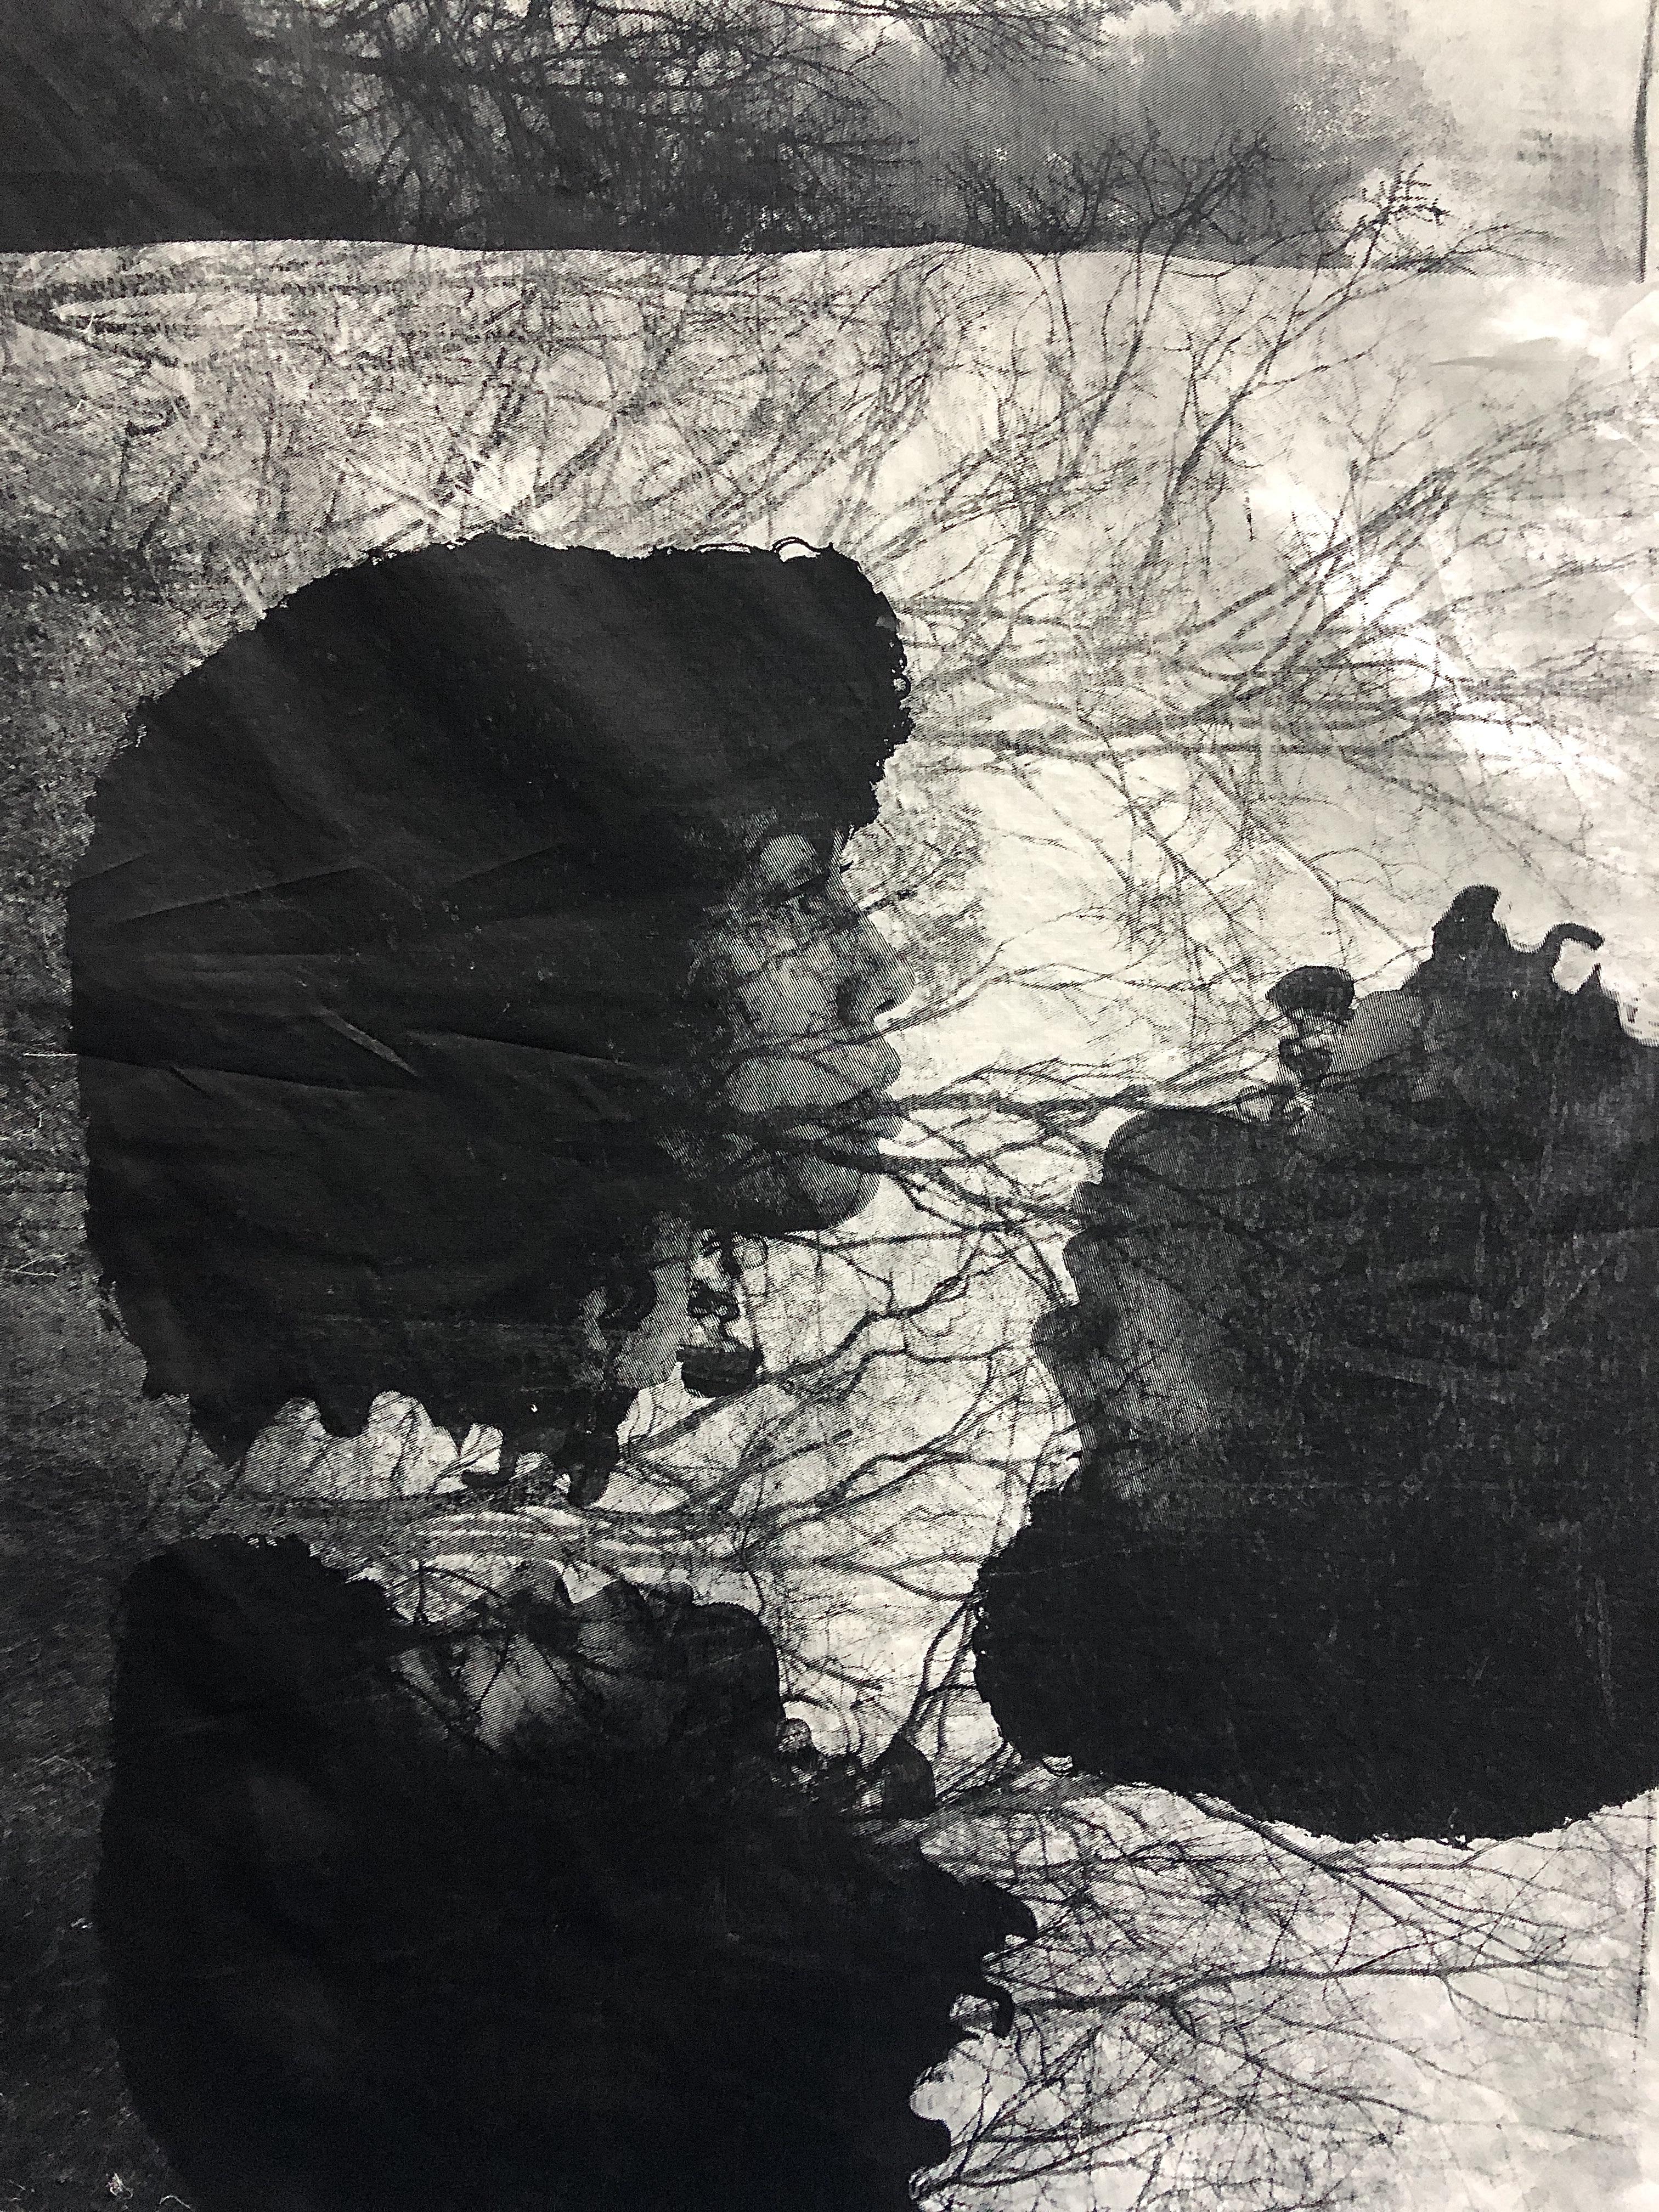 Work in progress, studio view Black Rock Senegal, 2020. Image courtesy of the artist & Mariane Ibrahim Gallery